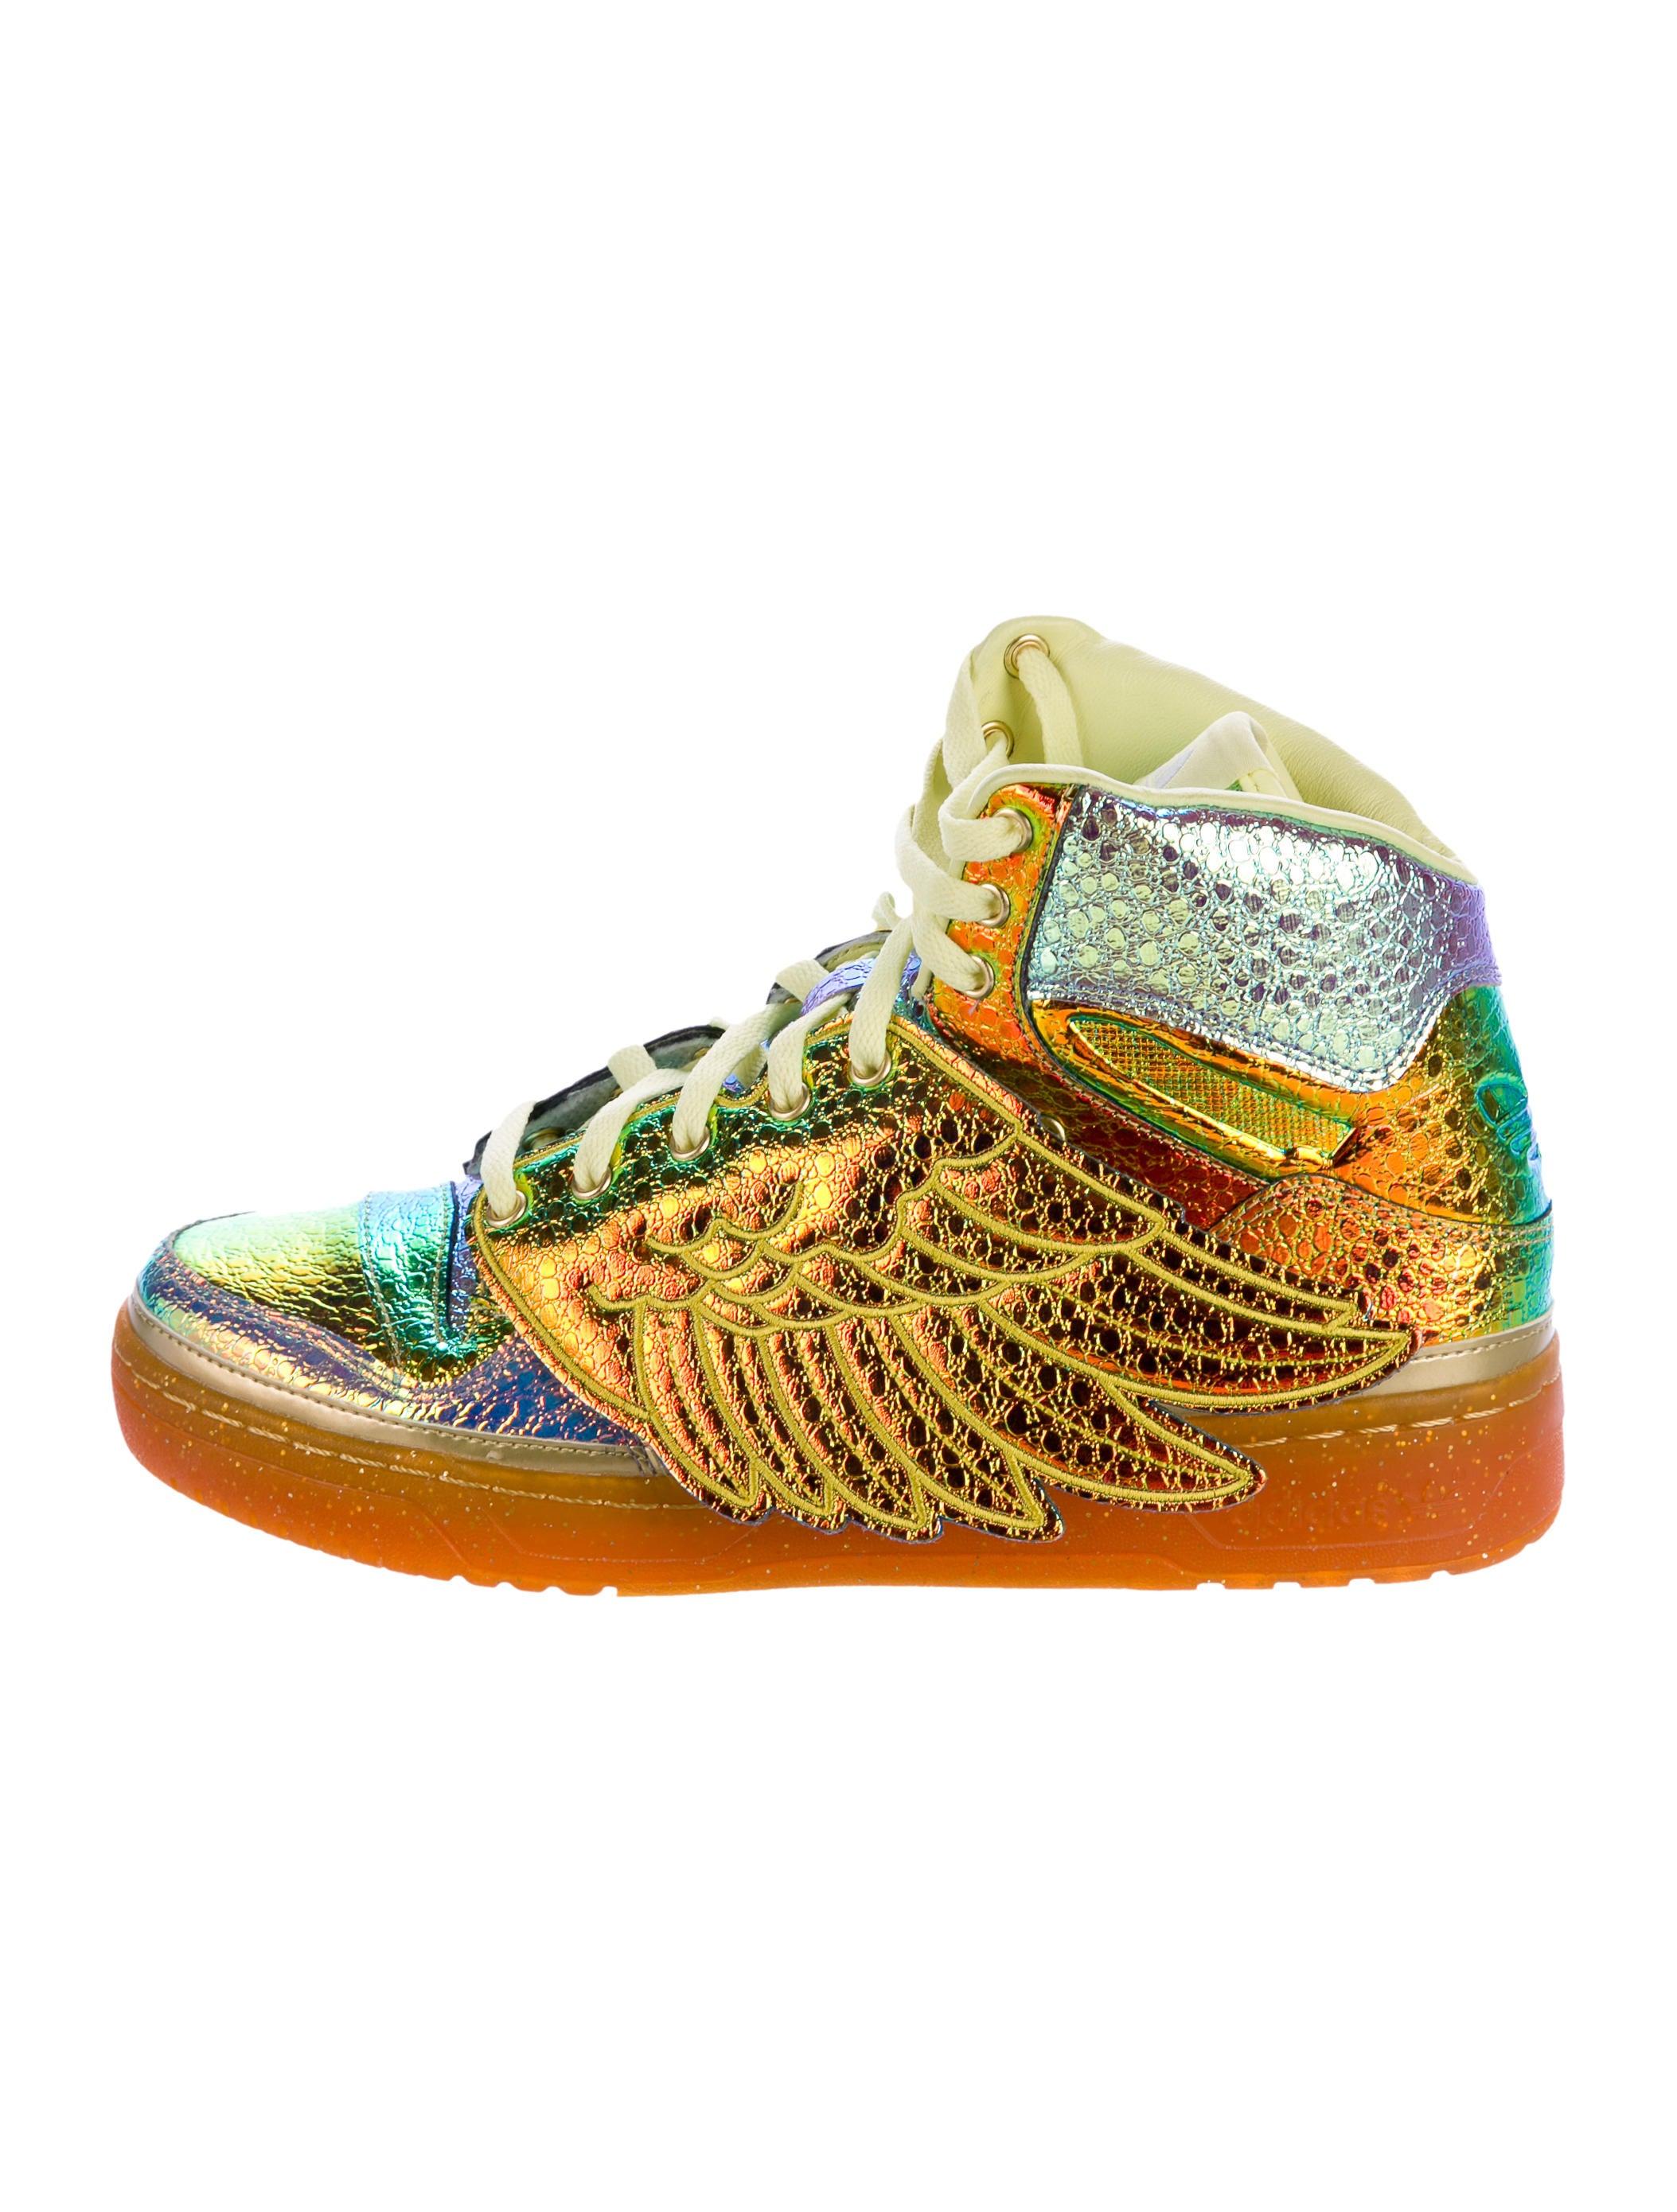 7ef60da5e5f602 Jeremy Scott x Adidas Foil Wing Sneakers w  Tags - Shoes - WJA20266 ...